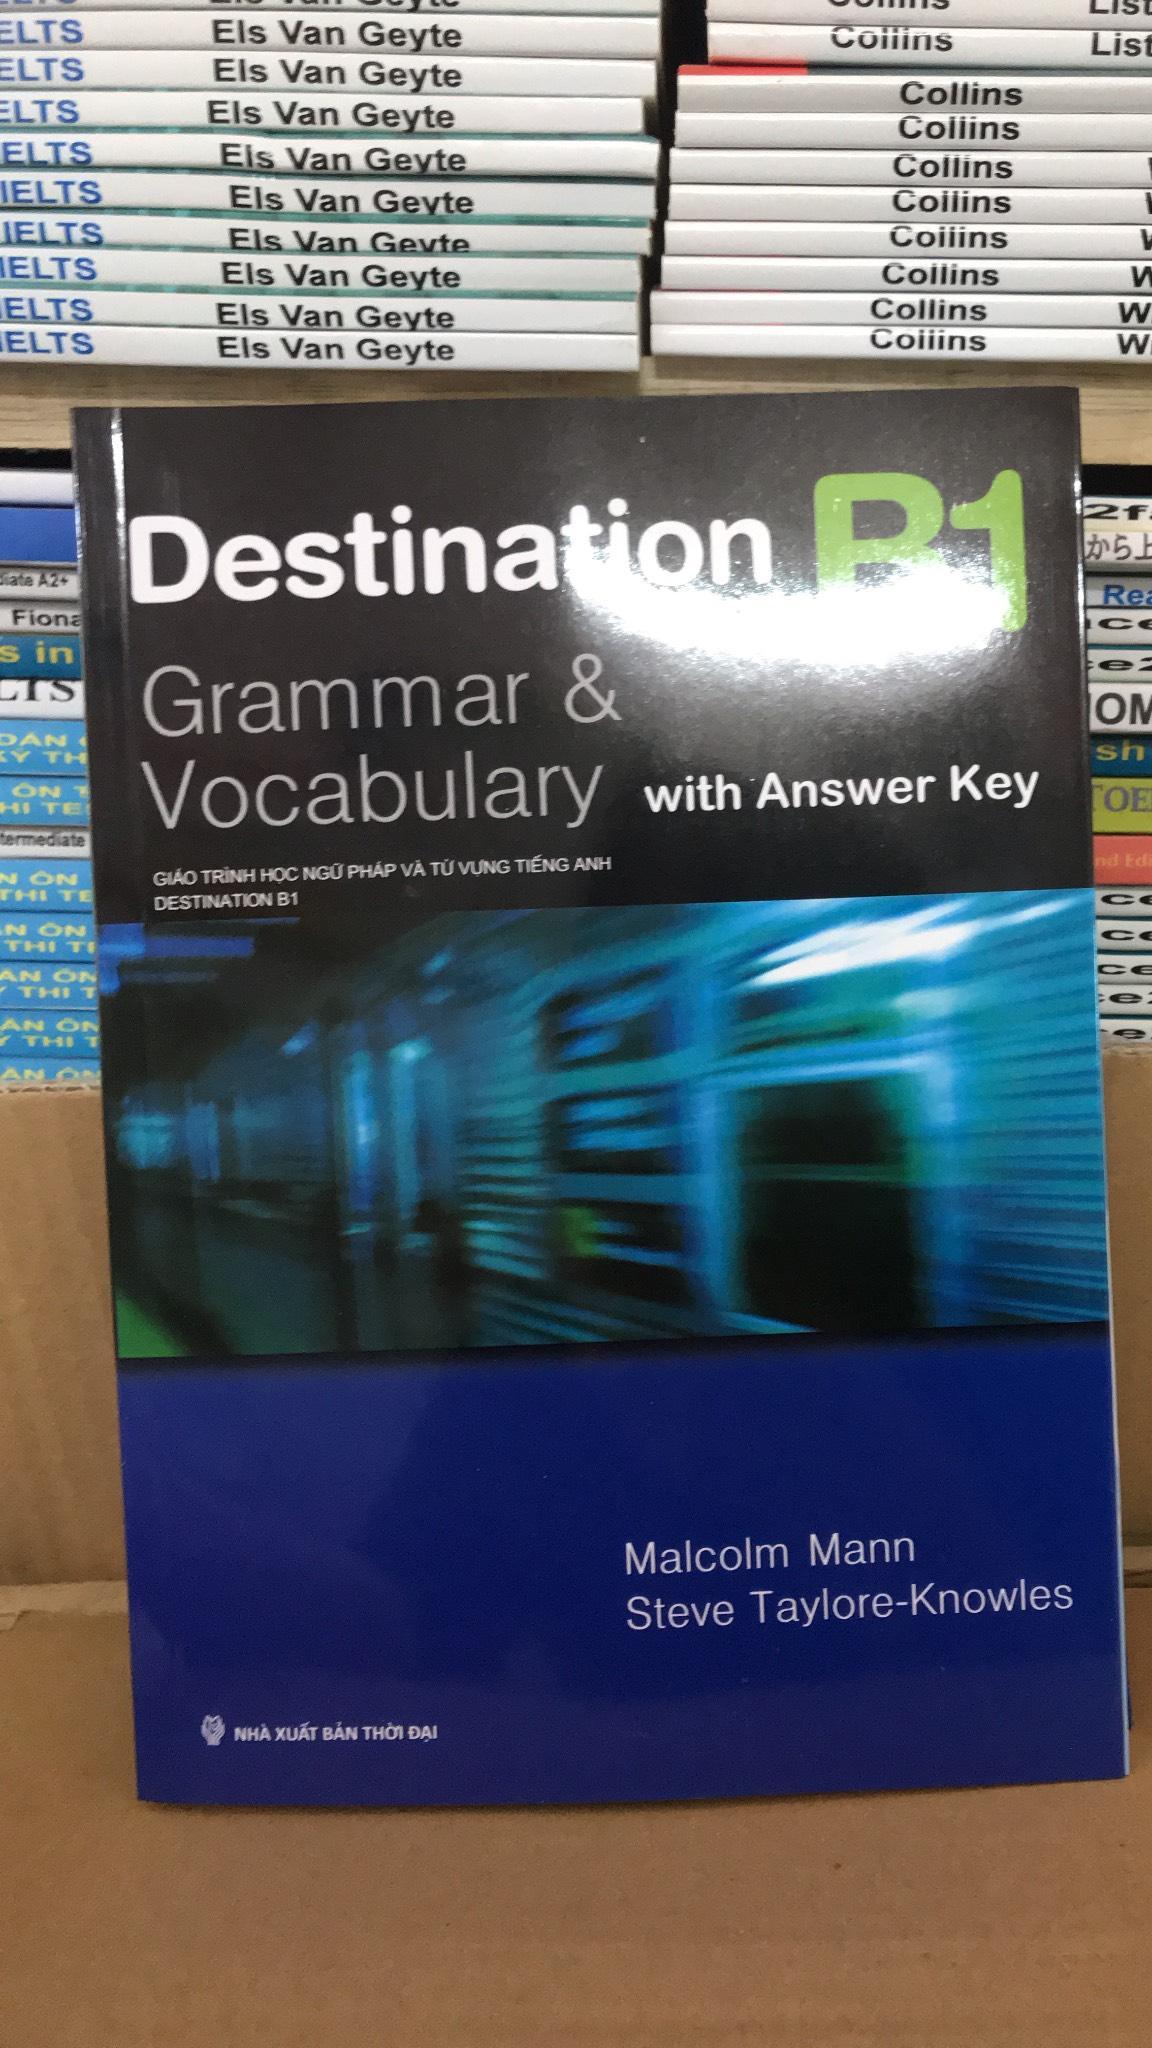 Destination B1 Grammar And Vocabulary Siêu Giảm Giá